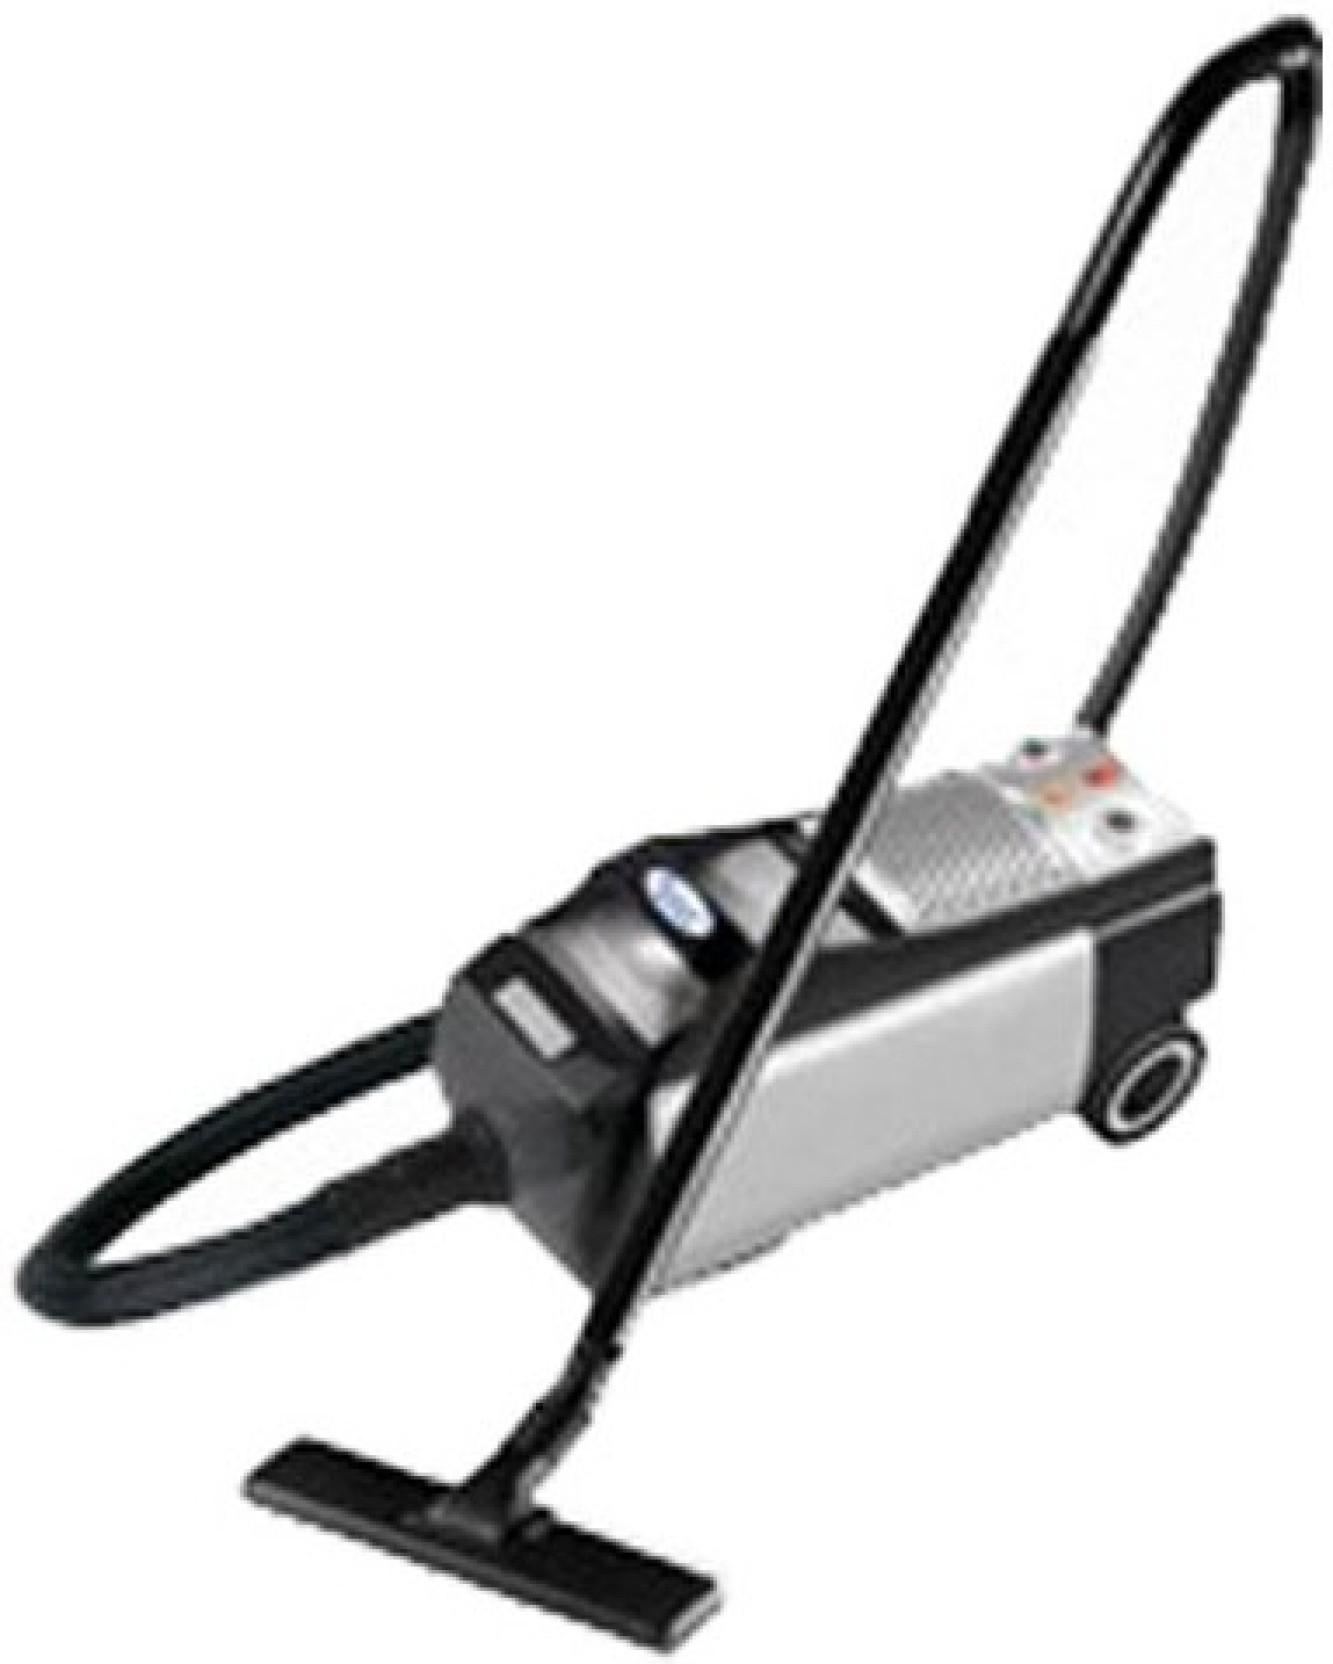 Eureka Forbes Euroclean Star Dry Vacuum Cleaner Price In